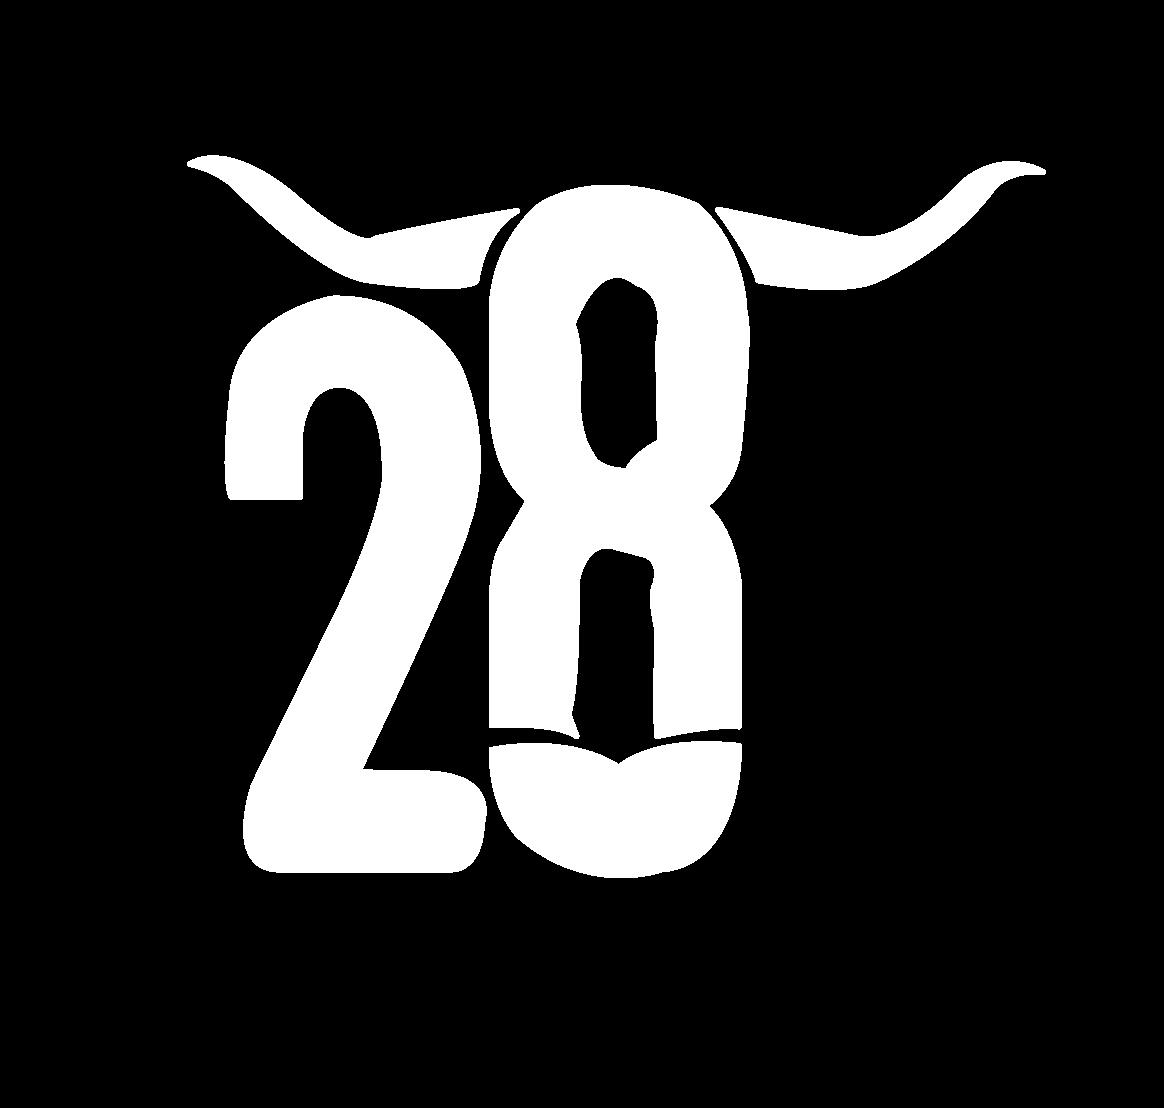 28 Well Hung logo